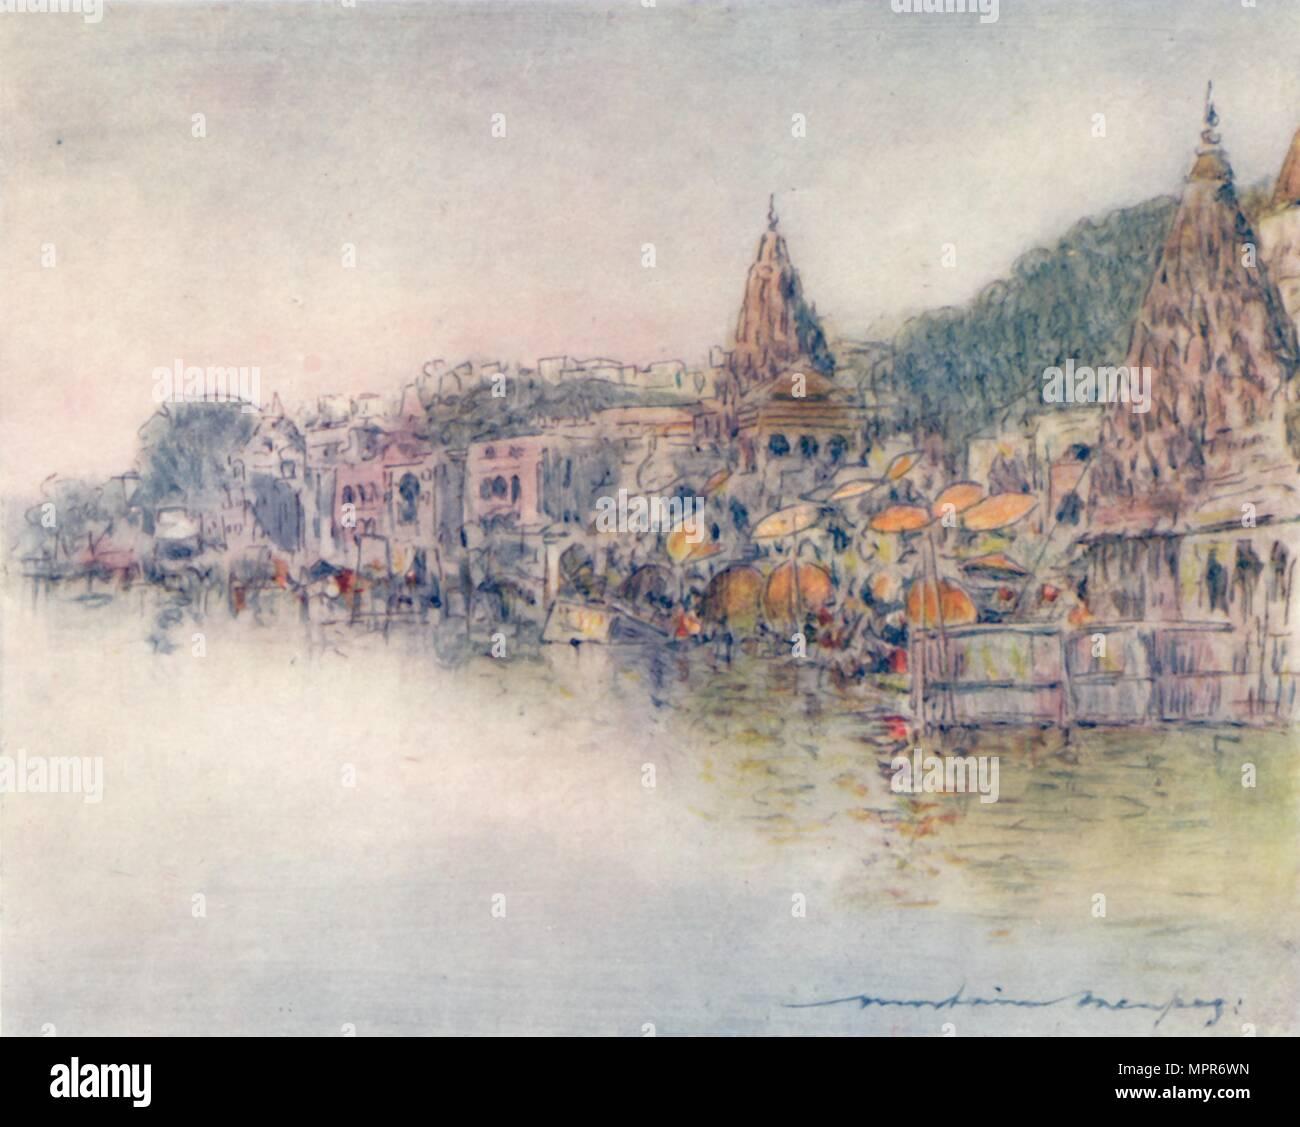 'On the Banks of Holy River, Benares', 1905. Artist: Mortimer Luddington Menpes. - Stock Image